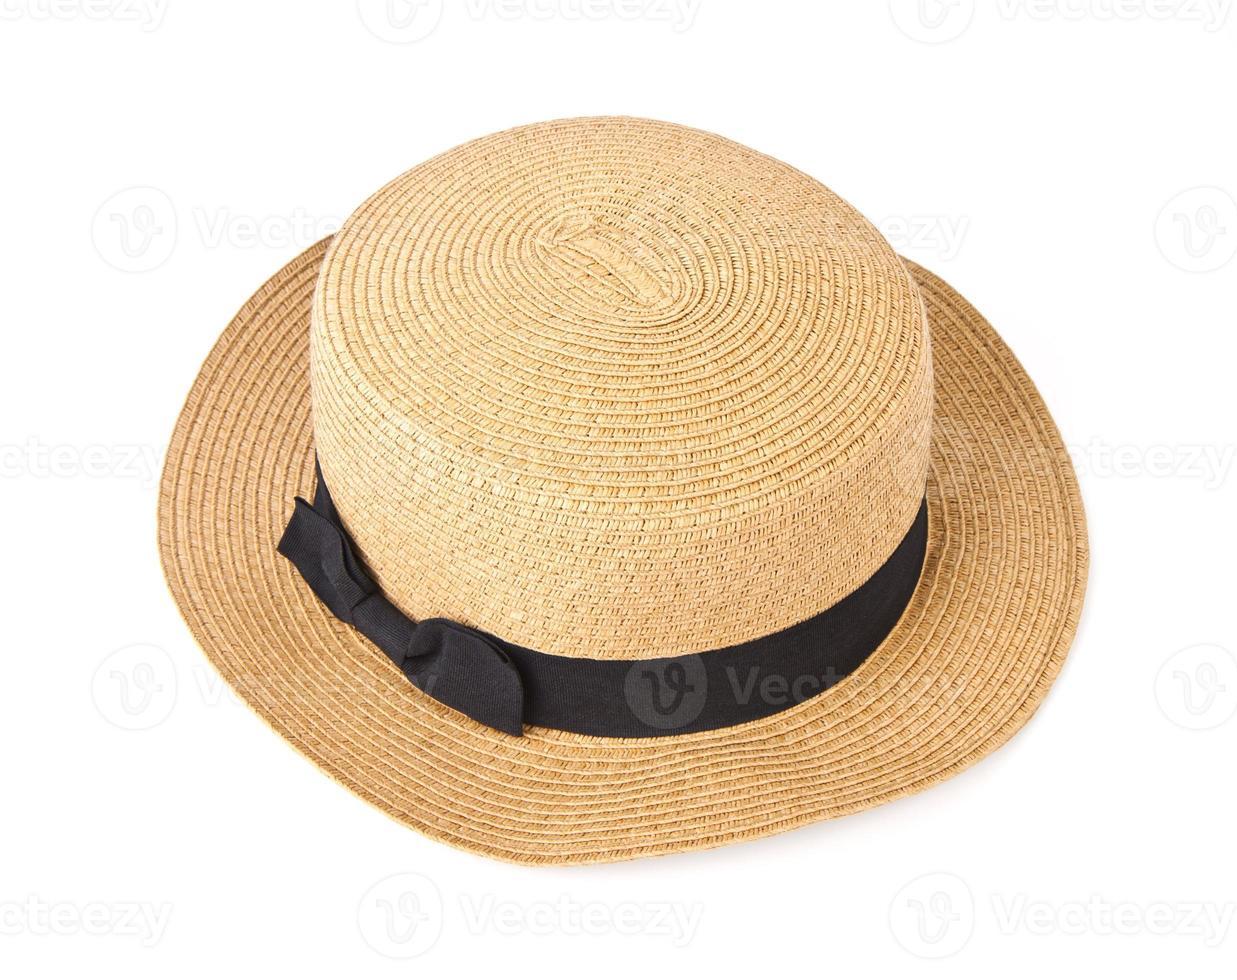 chapéu de palha com fita preta isolada foto